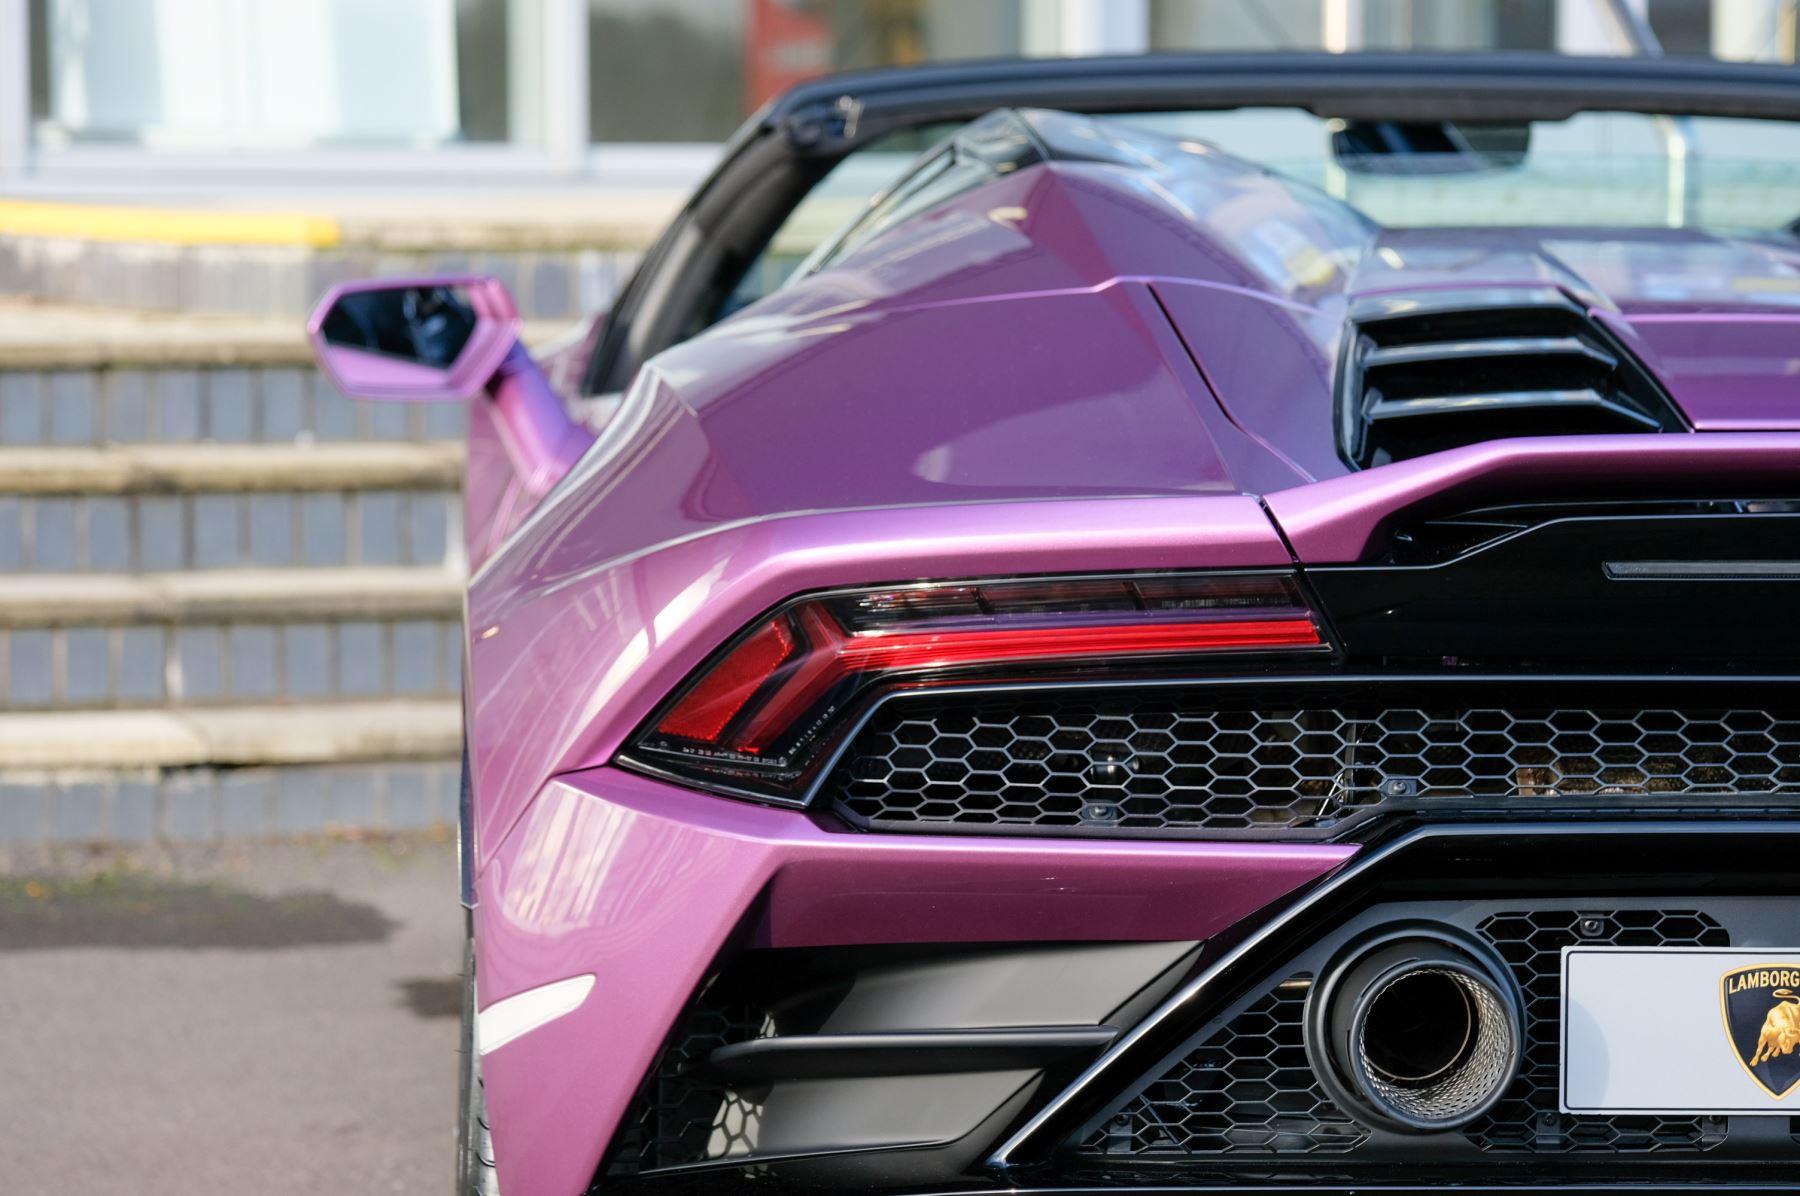 Lamborghini Huracan EVO Spyder 5.2 V10 640 2dr Auto AWD image 11